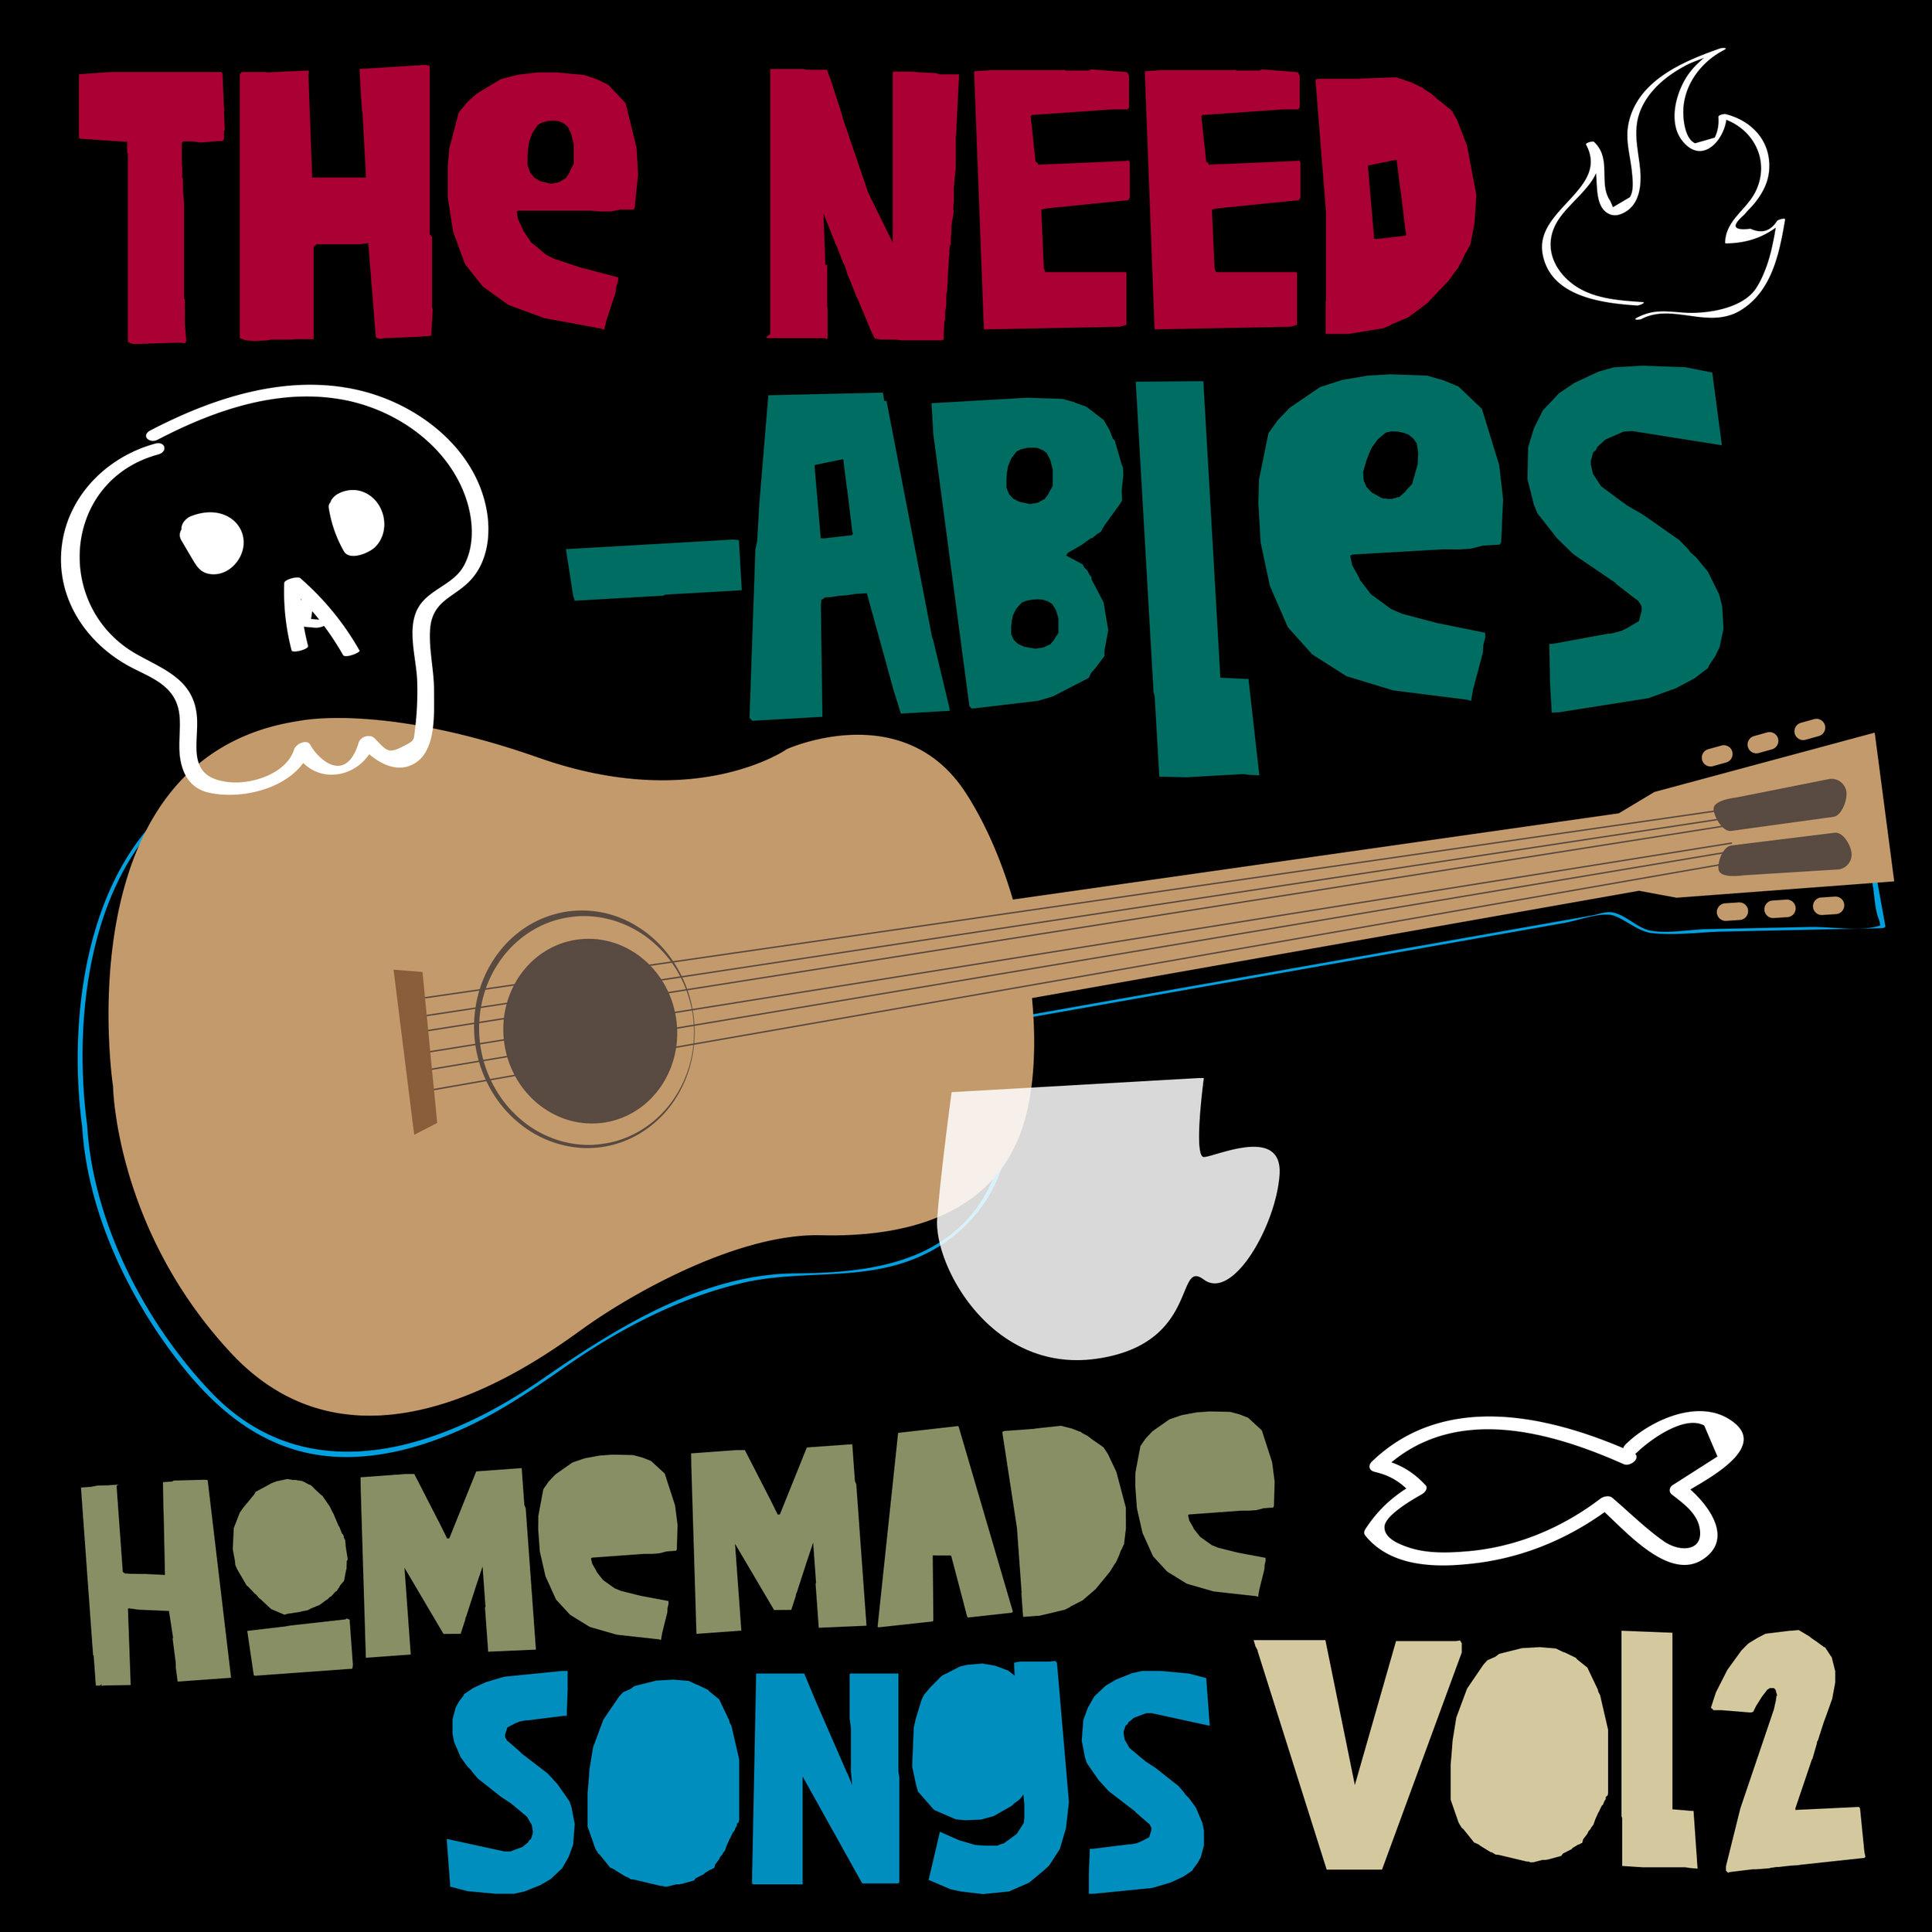 The Needables Homemade Songs Vol 2.jpg